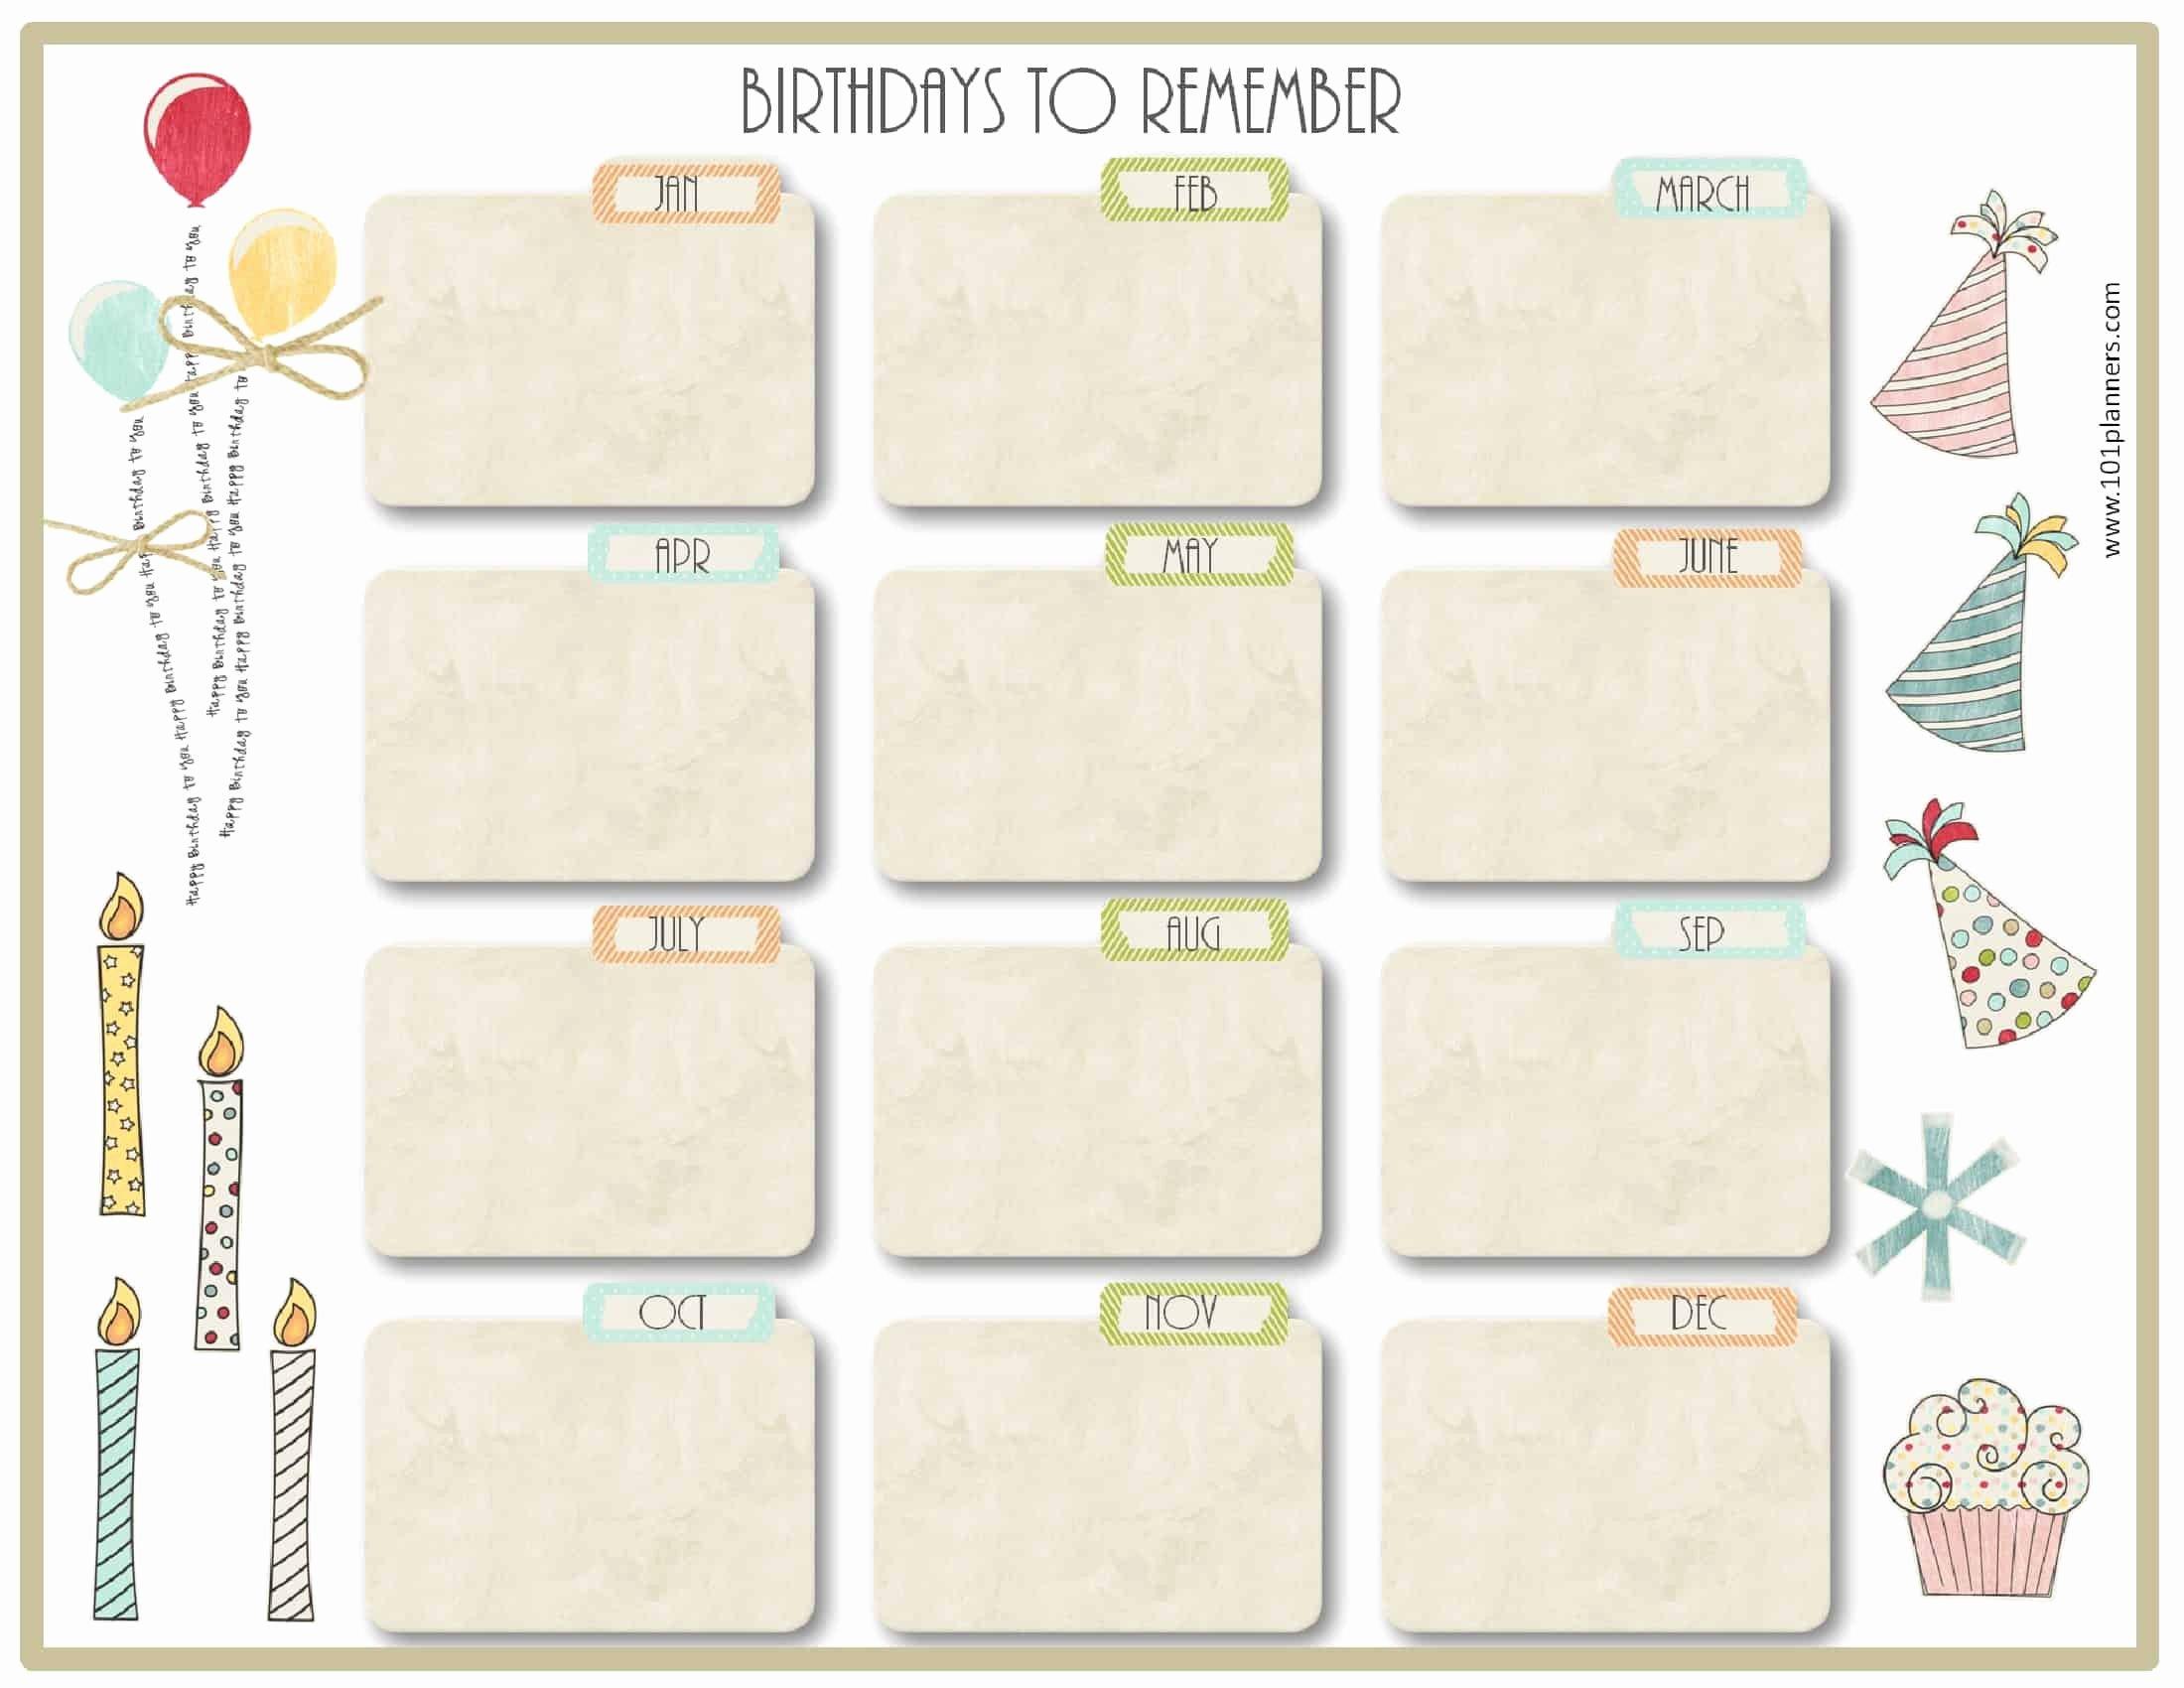 Printable Birthday Calendar Template Luxury Free Birthday Calendar